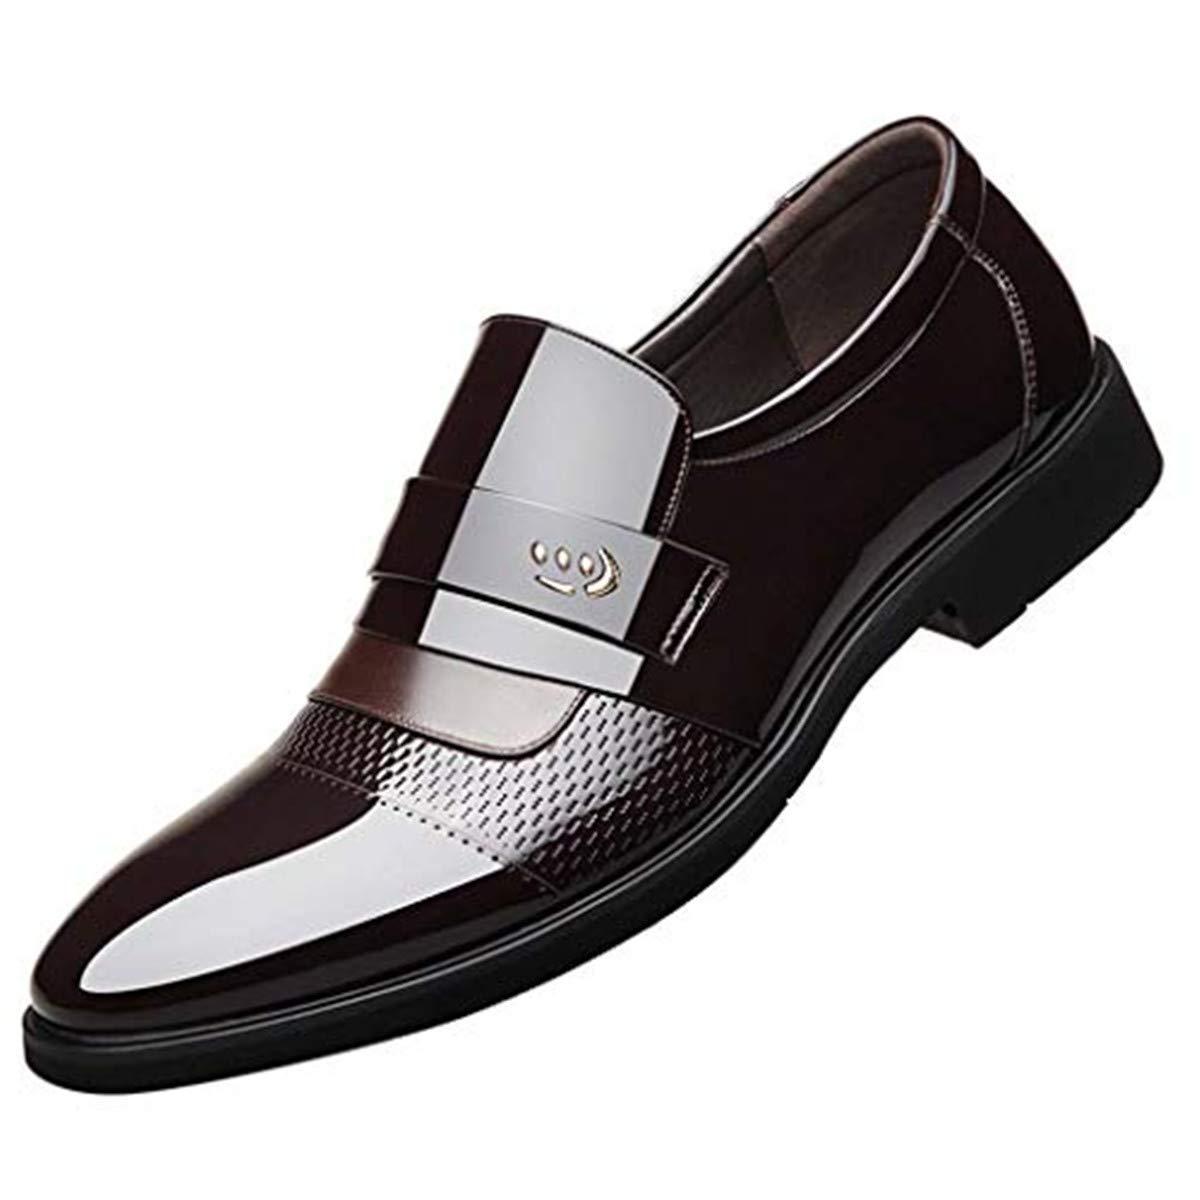 Men's Oxford Sneaker Dress Shoes-Men Business Men's Single Shoes Pointed Leather Patent Leather Business Men's Shoes